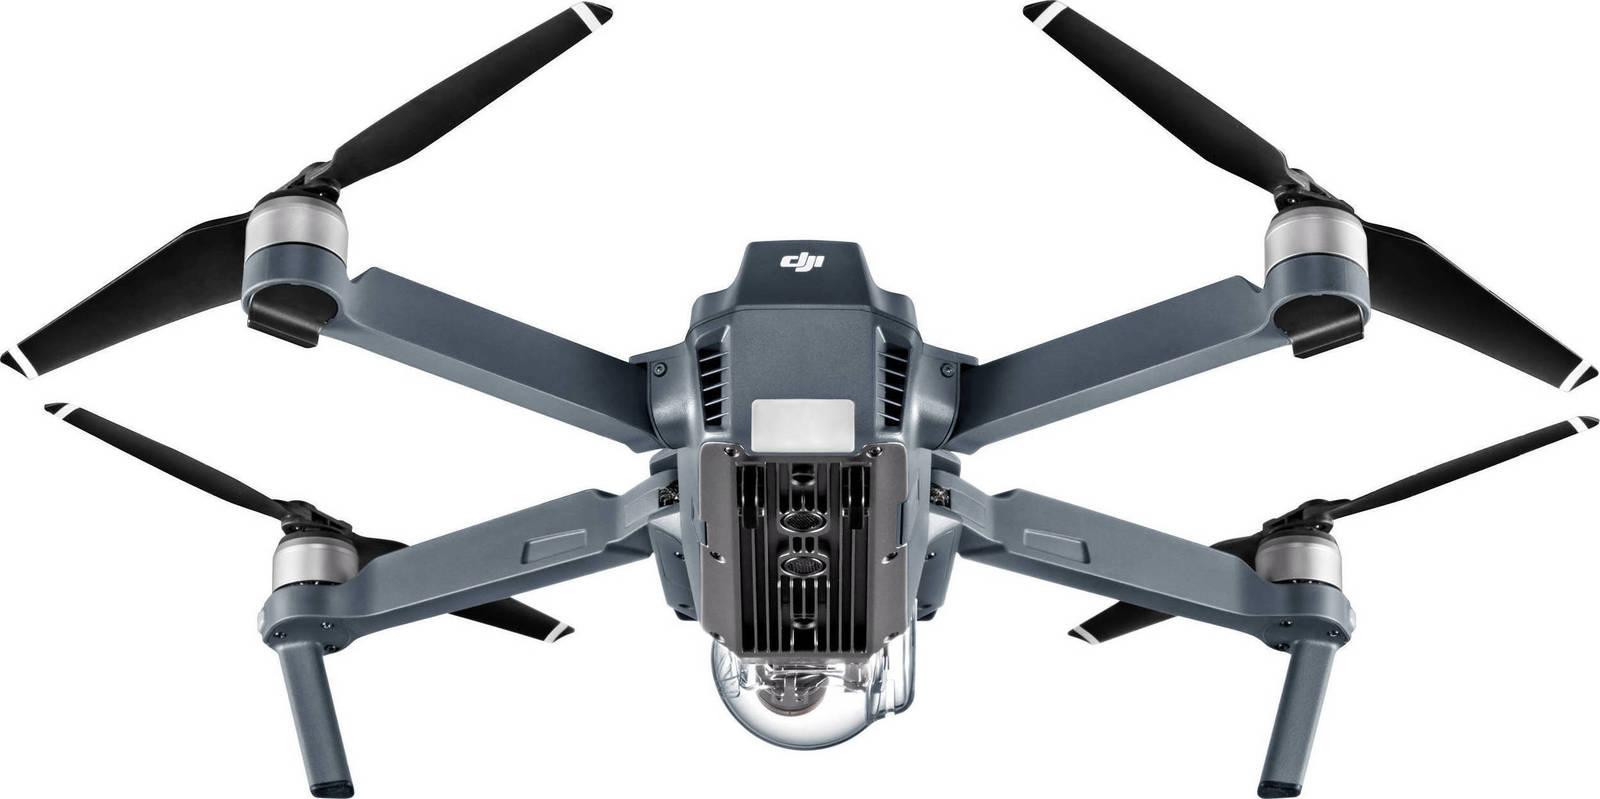 DJI Mavic Pro Fly More Combo Drone Πληρωμή έως 12 δόσεις